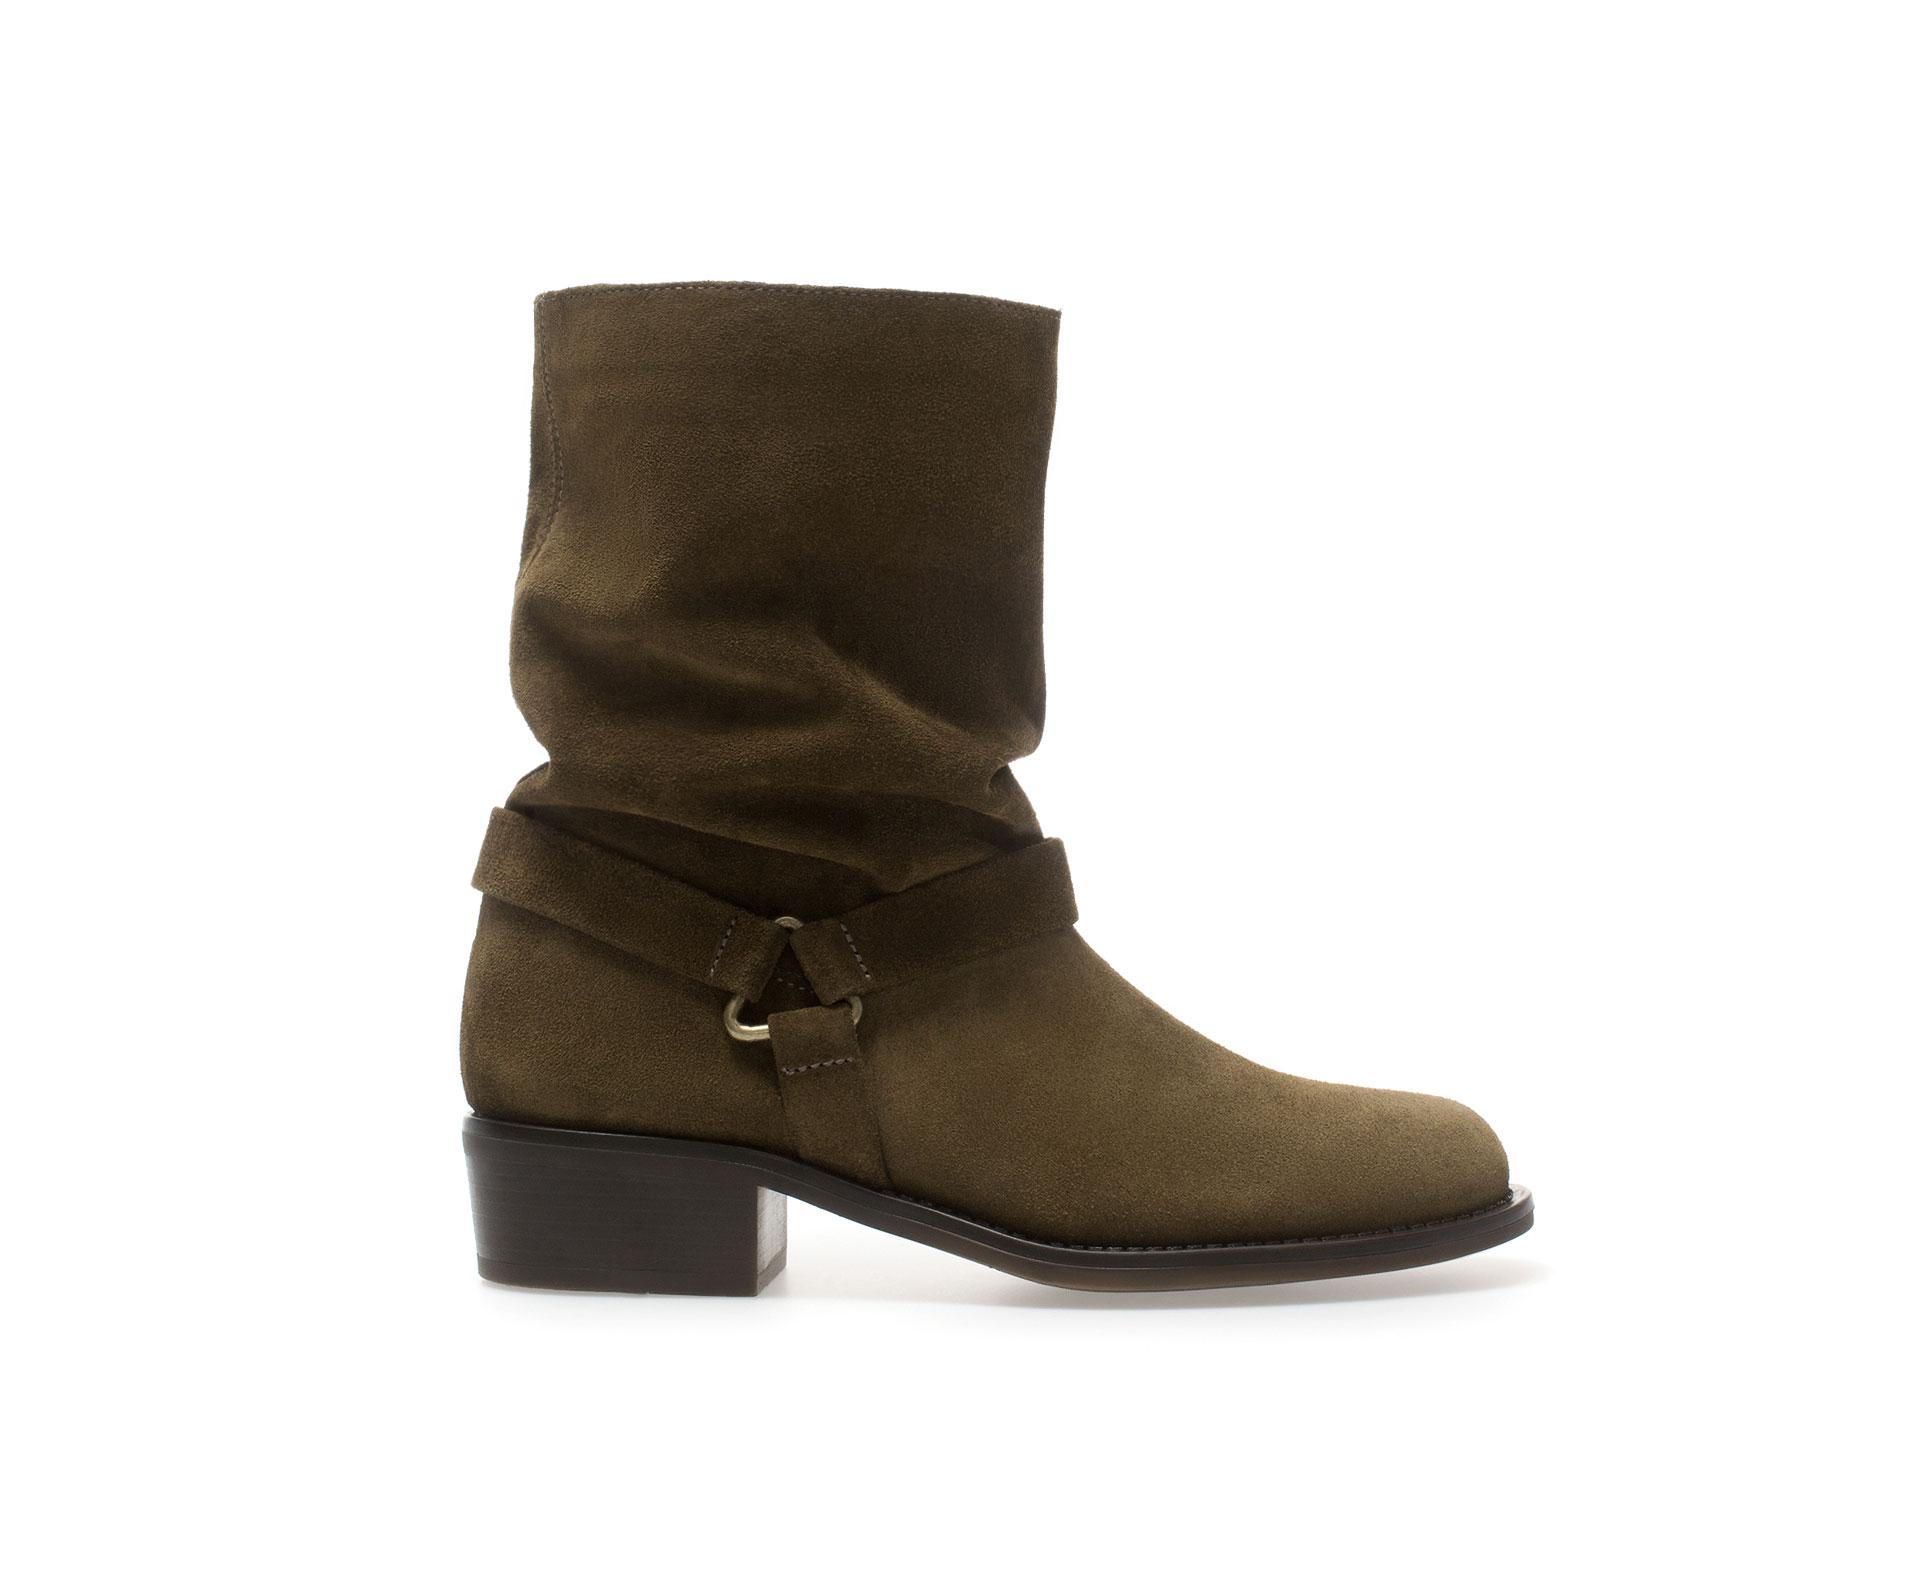 zara flat leather ankle boot in khaki lyst